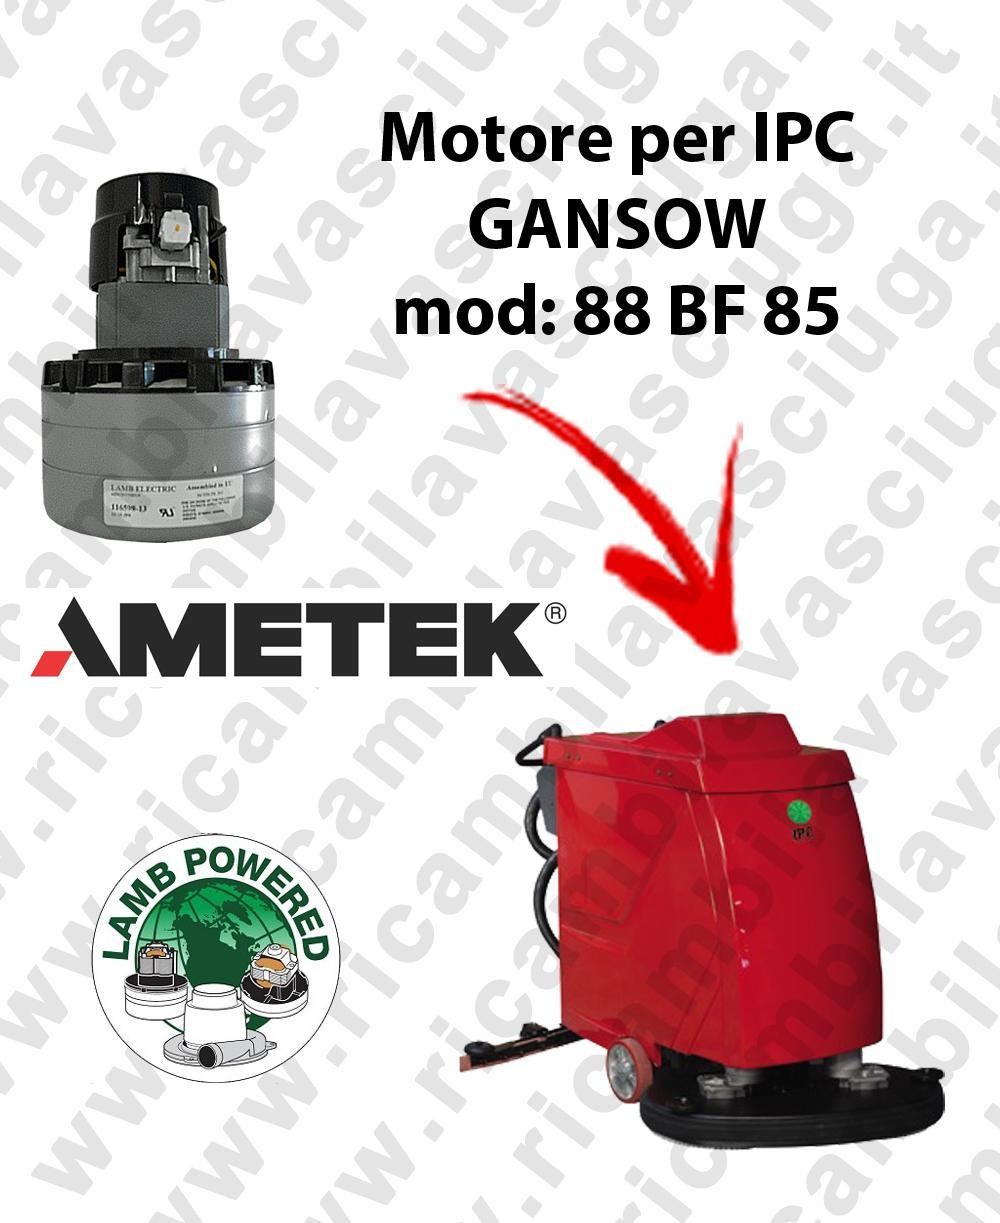 88 BF 85 LAMB AMETEK vacuum motor for scrubber dryer IPC GANSOW